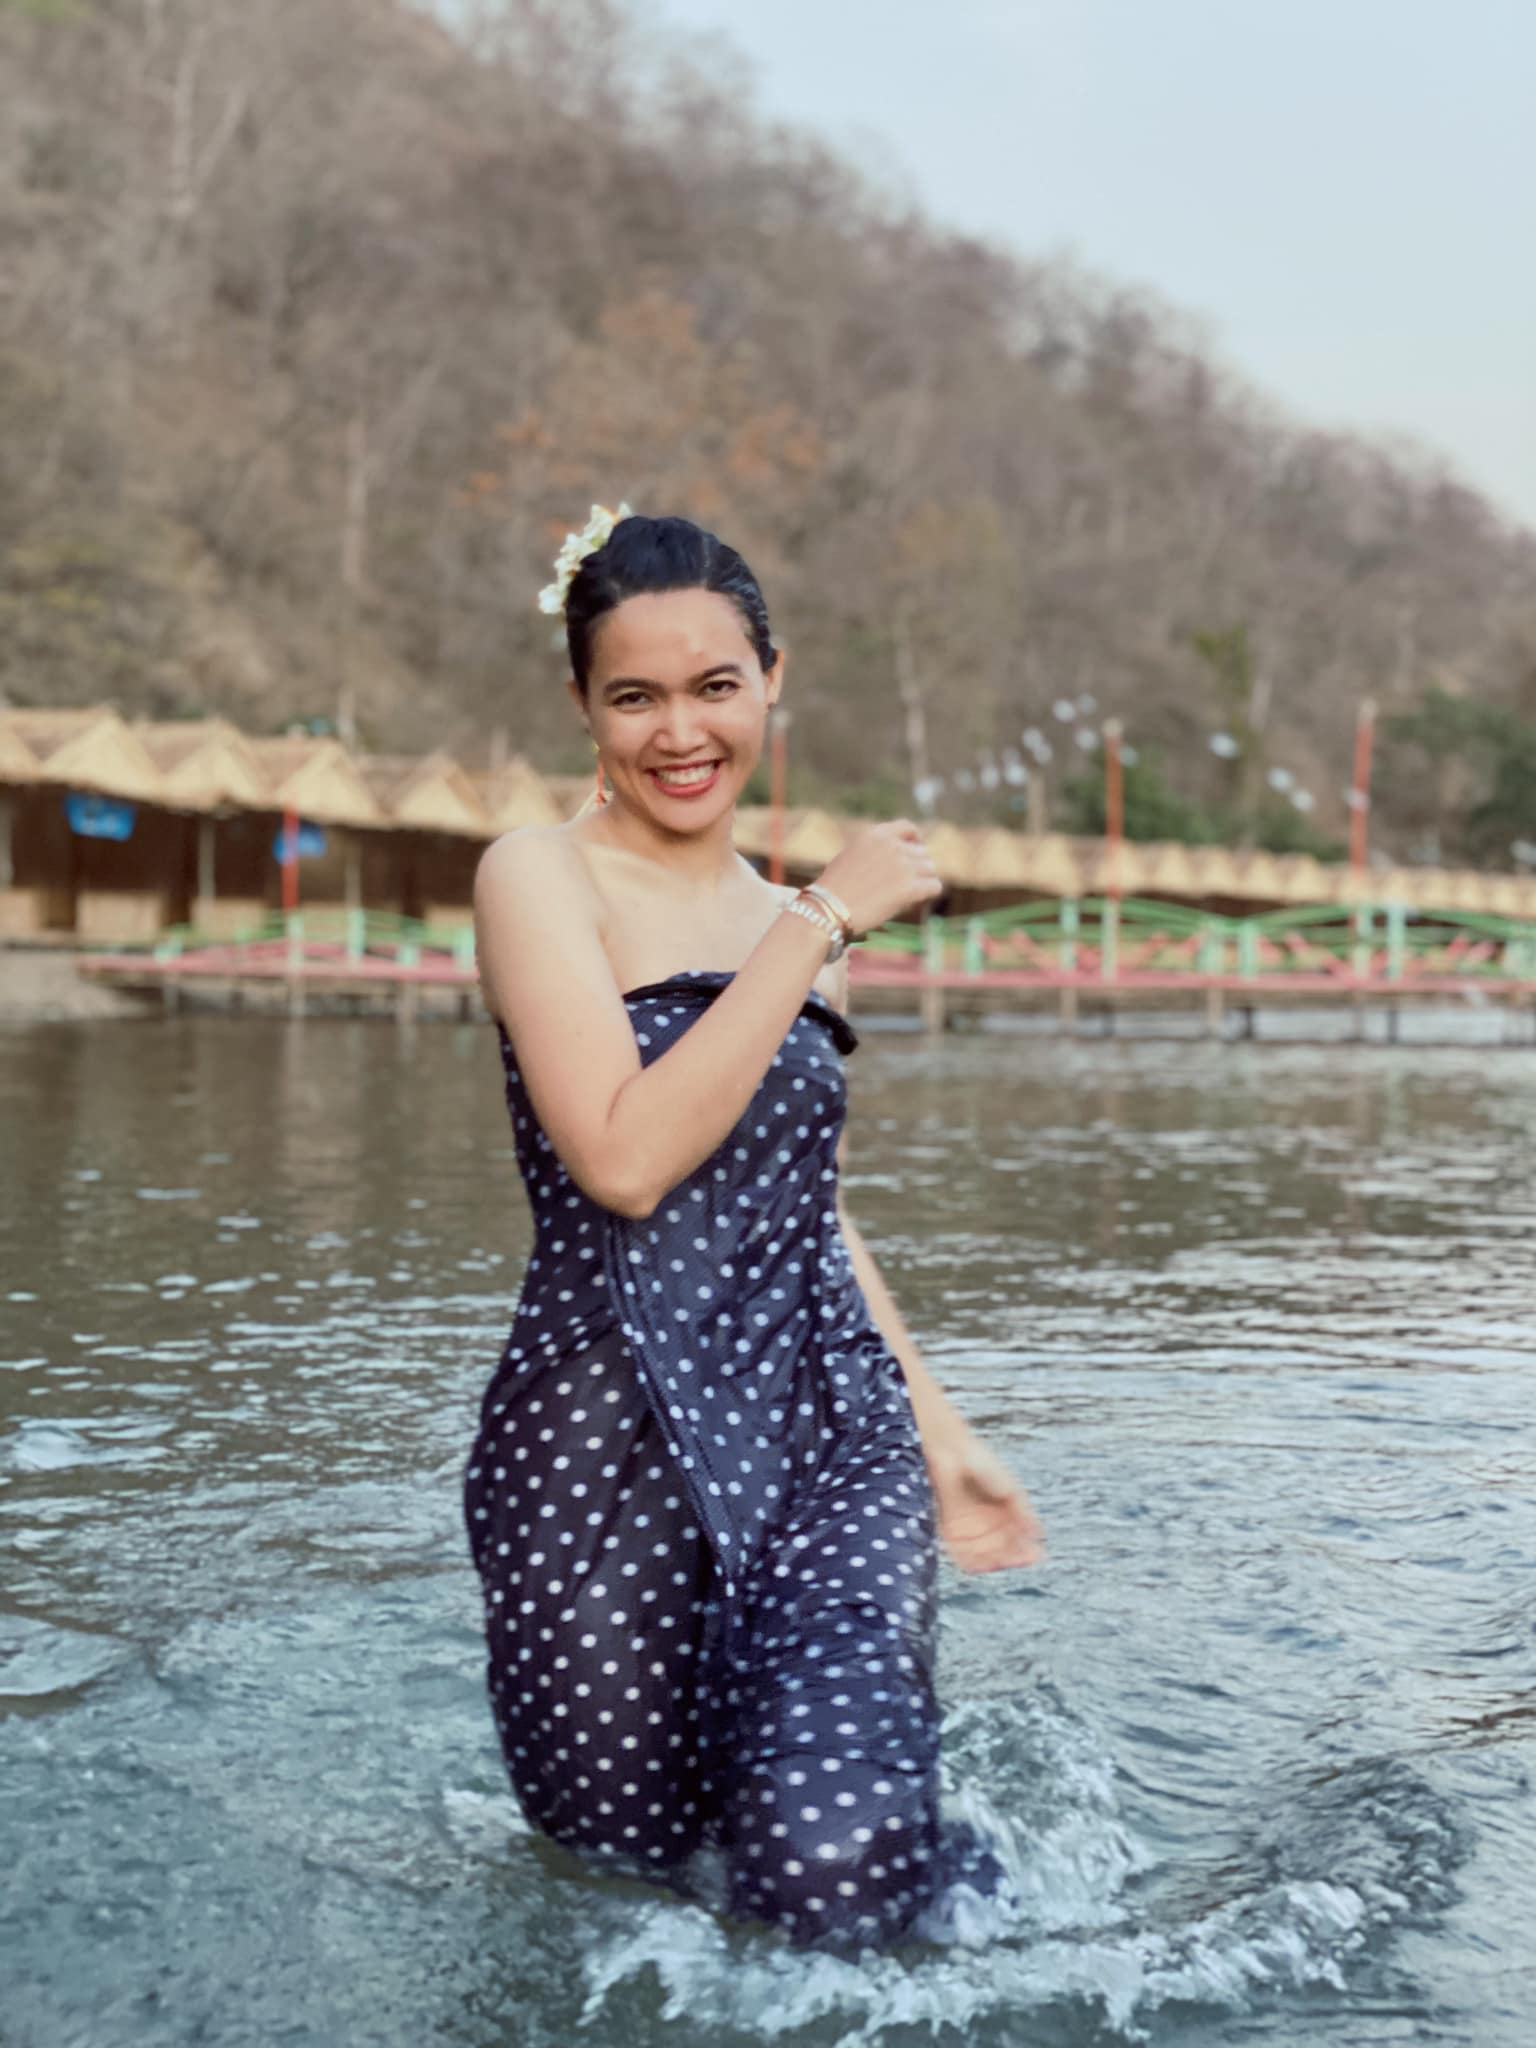 photo by Aye Myat Thu